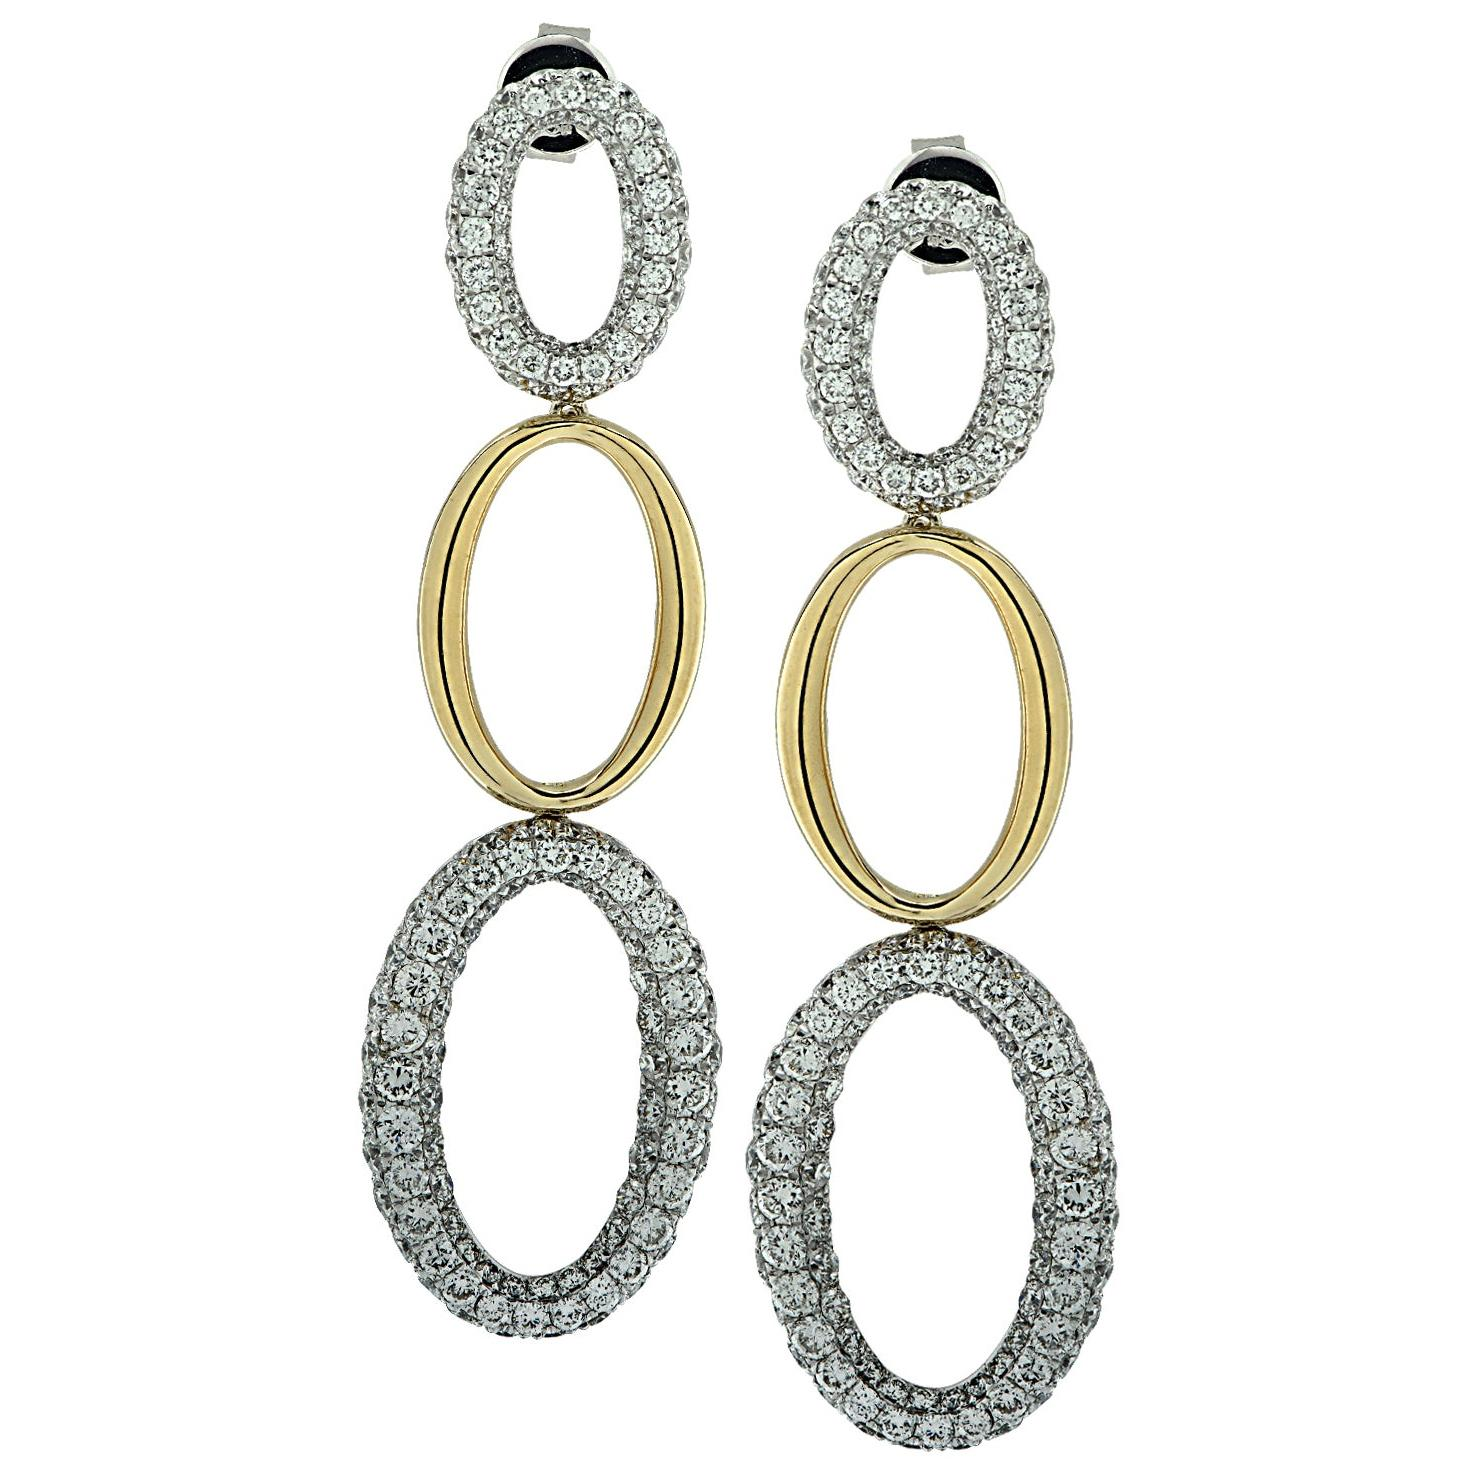 18 Karat Two Tone Diamond Encrusted Dangle Earrings